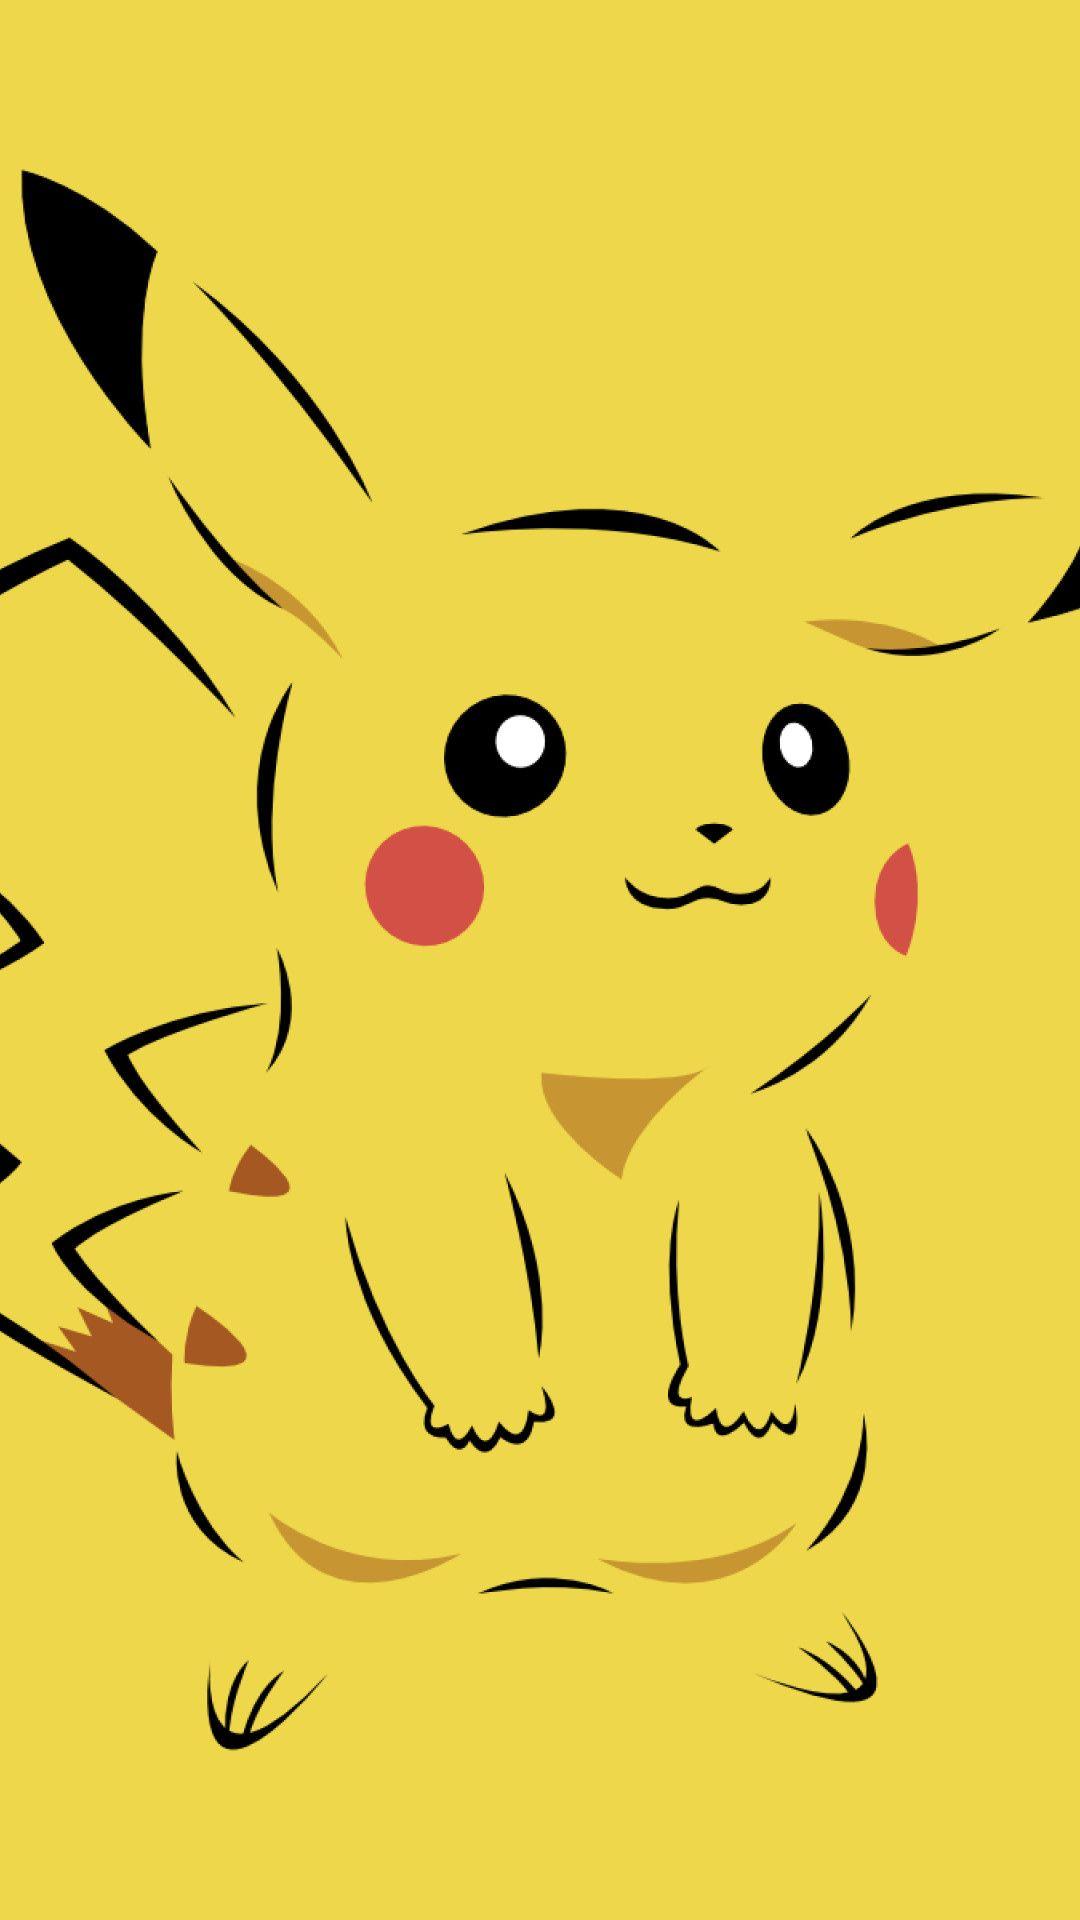 1080x1920 Best Free Pokemon Iphone Wallpapers Pikachu Wallpaper